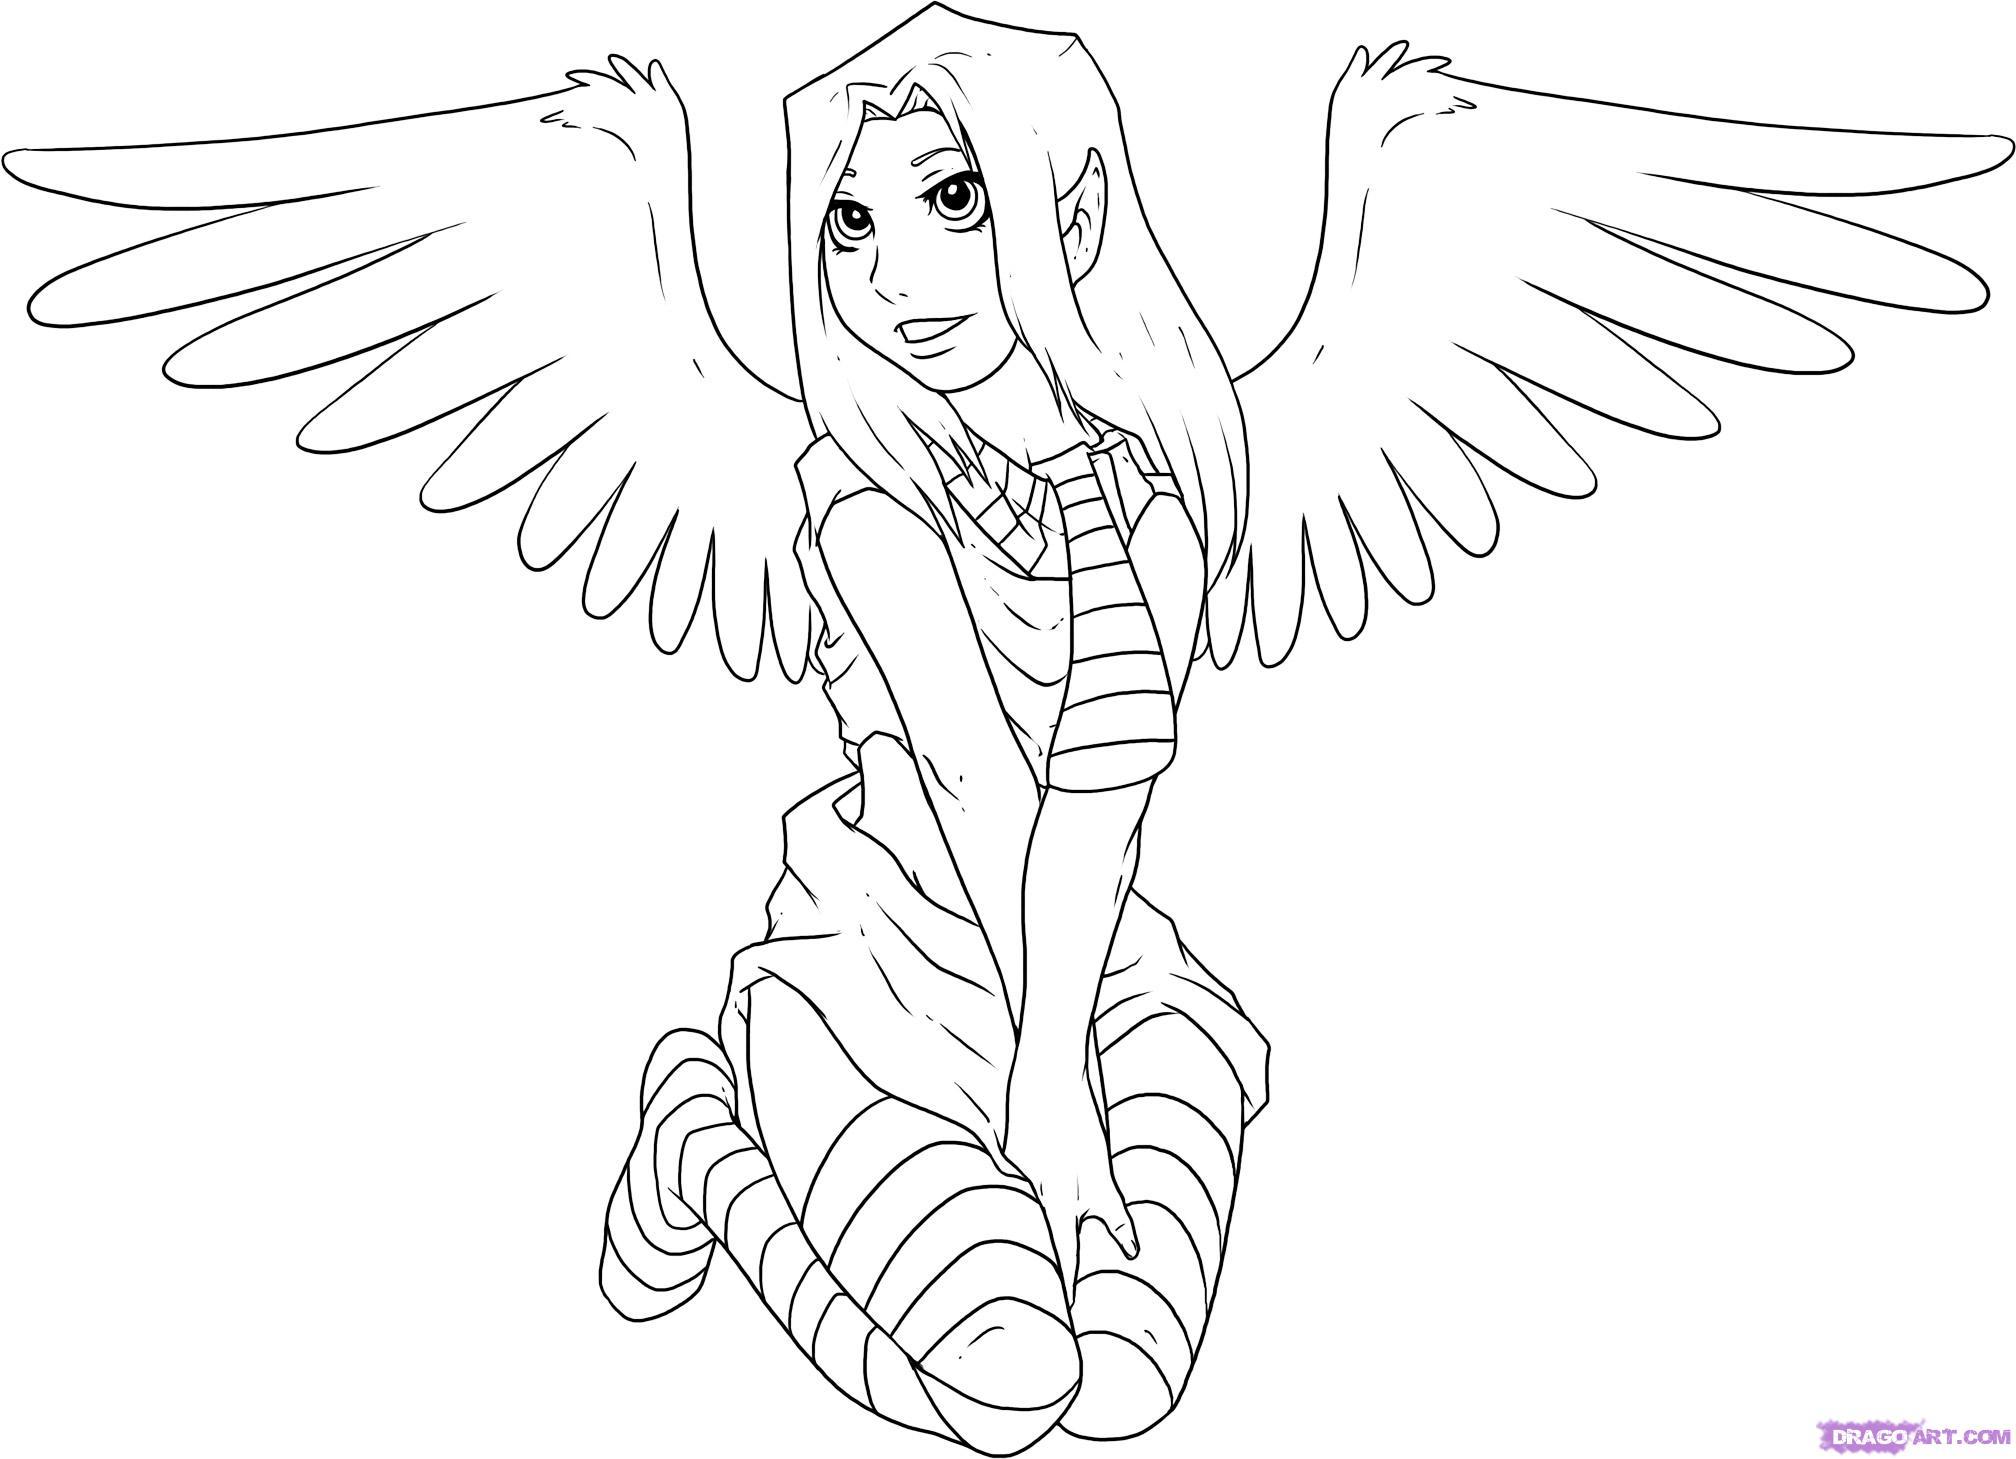 2016x1459 Graffiti Sketch Angel Angel Drawings Sketches Pencil Sketch Angel